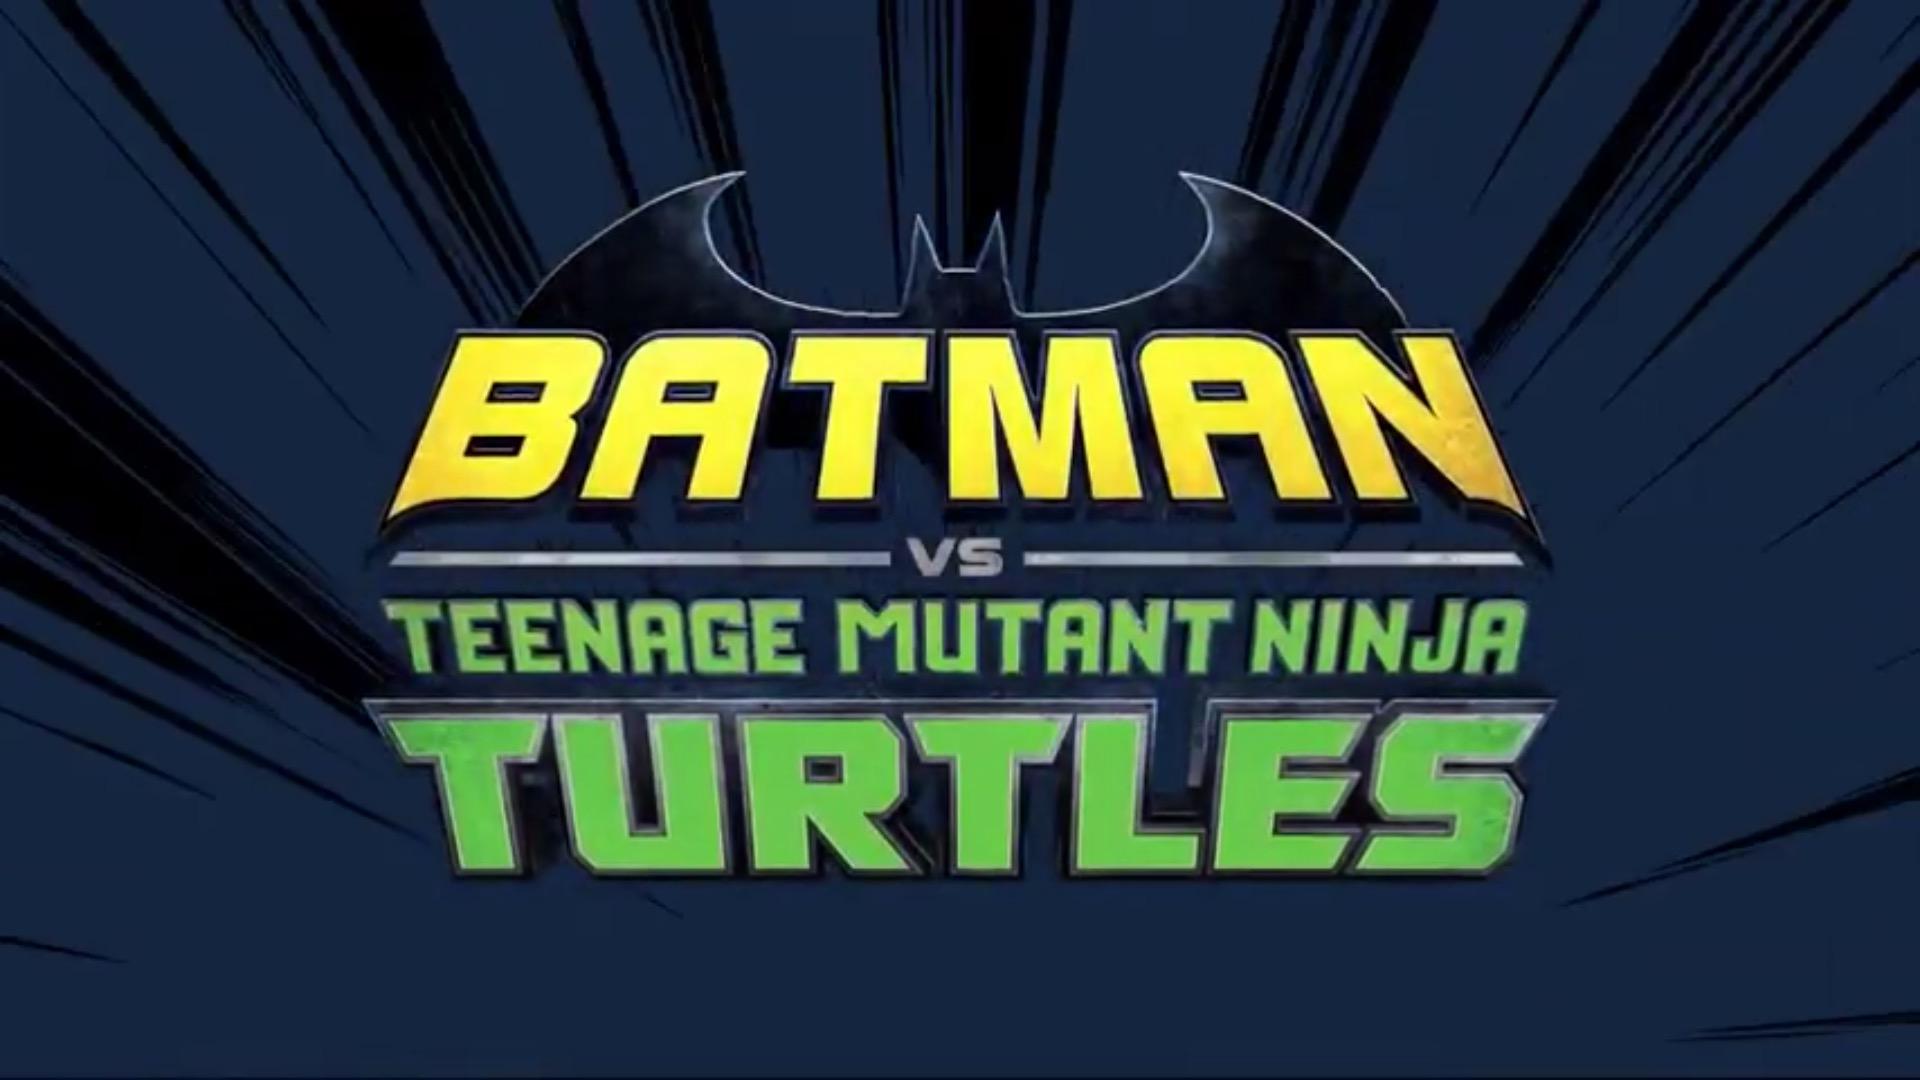 Batman Vs Teenage Mutant Ninja Turtles Trailer Is Here Batman News